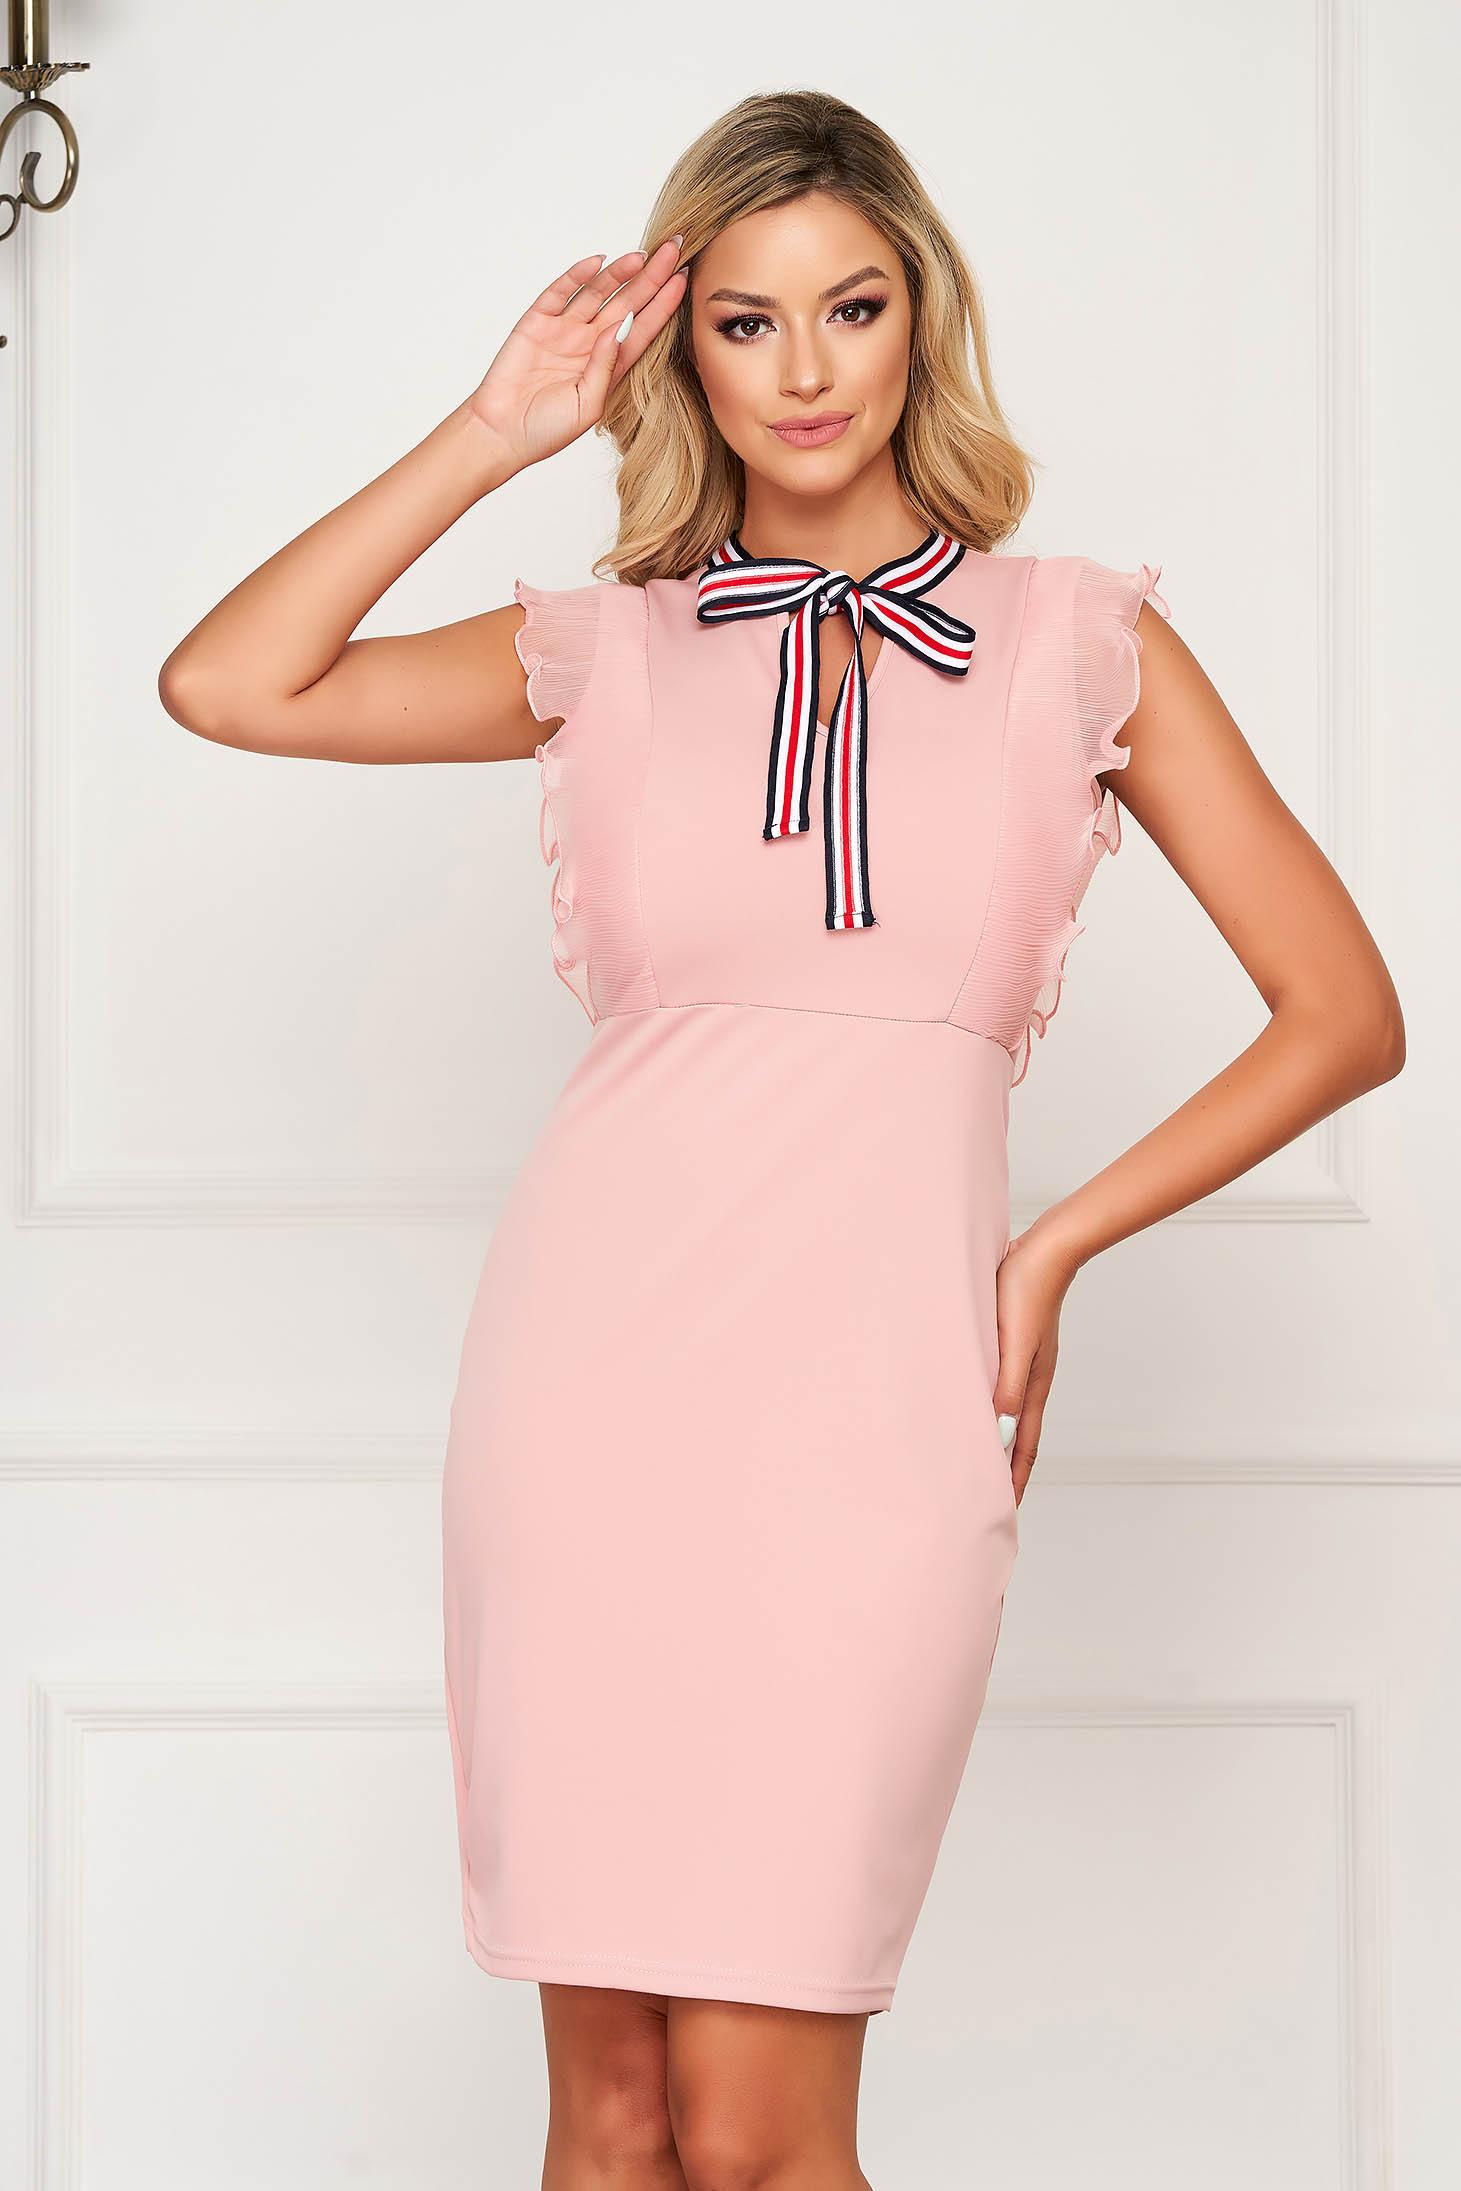 Rochie SunShine roz eleganta scurta tip creion cu volanase la maneca si accesorizata cu o fundita